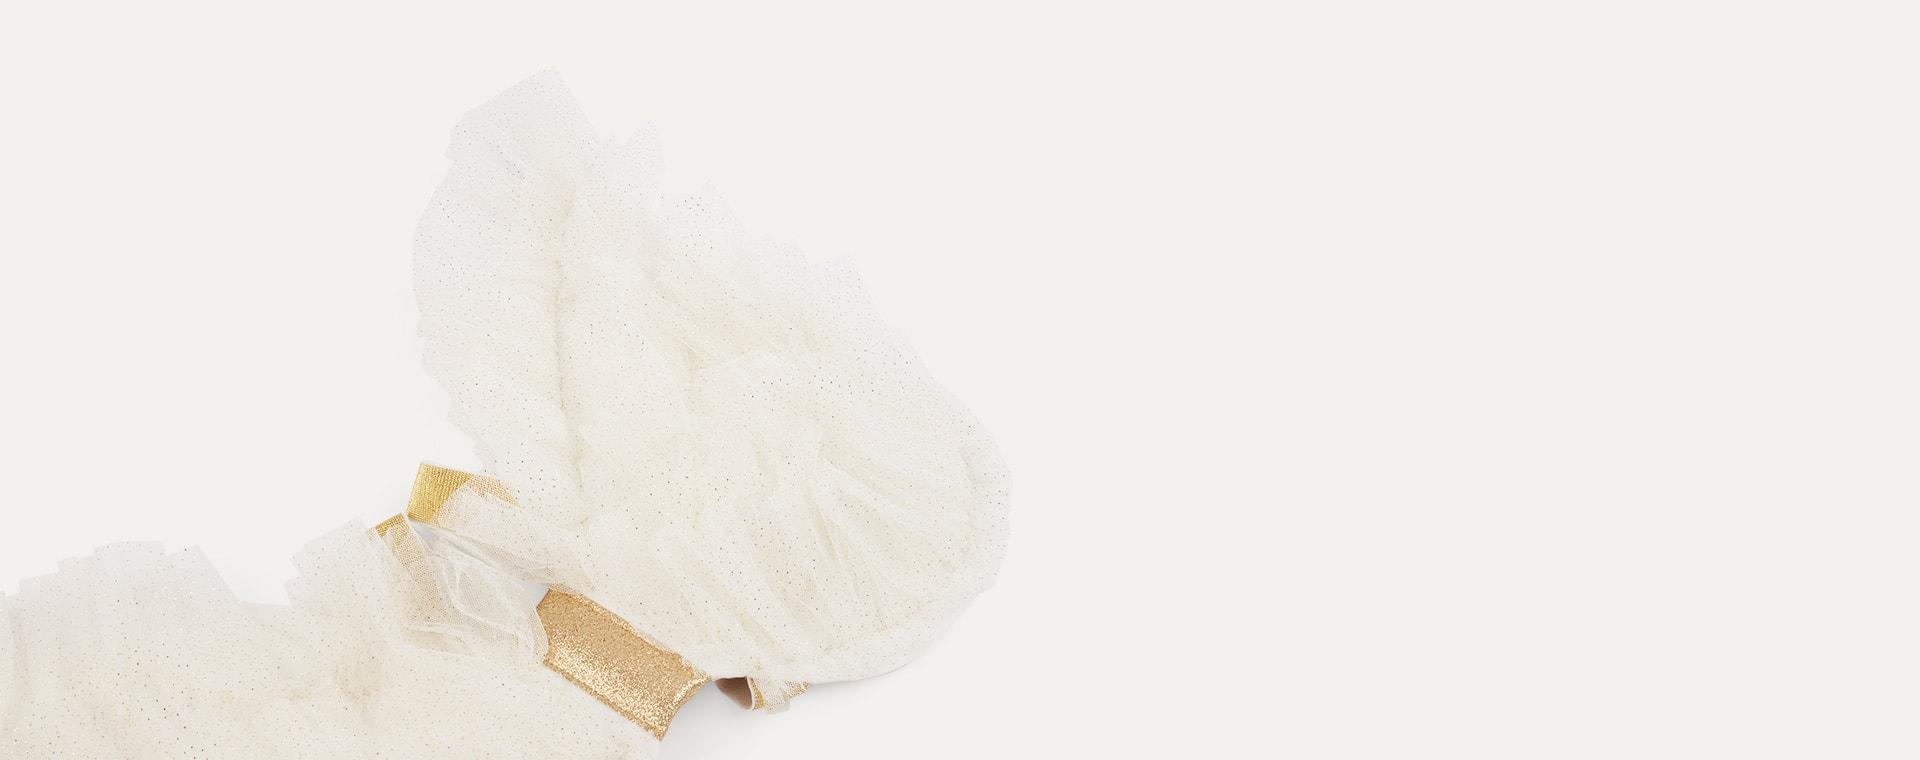 White Meri Meri Tulle Angel Wings Dress Up